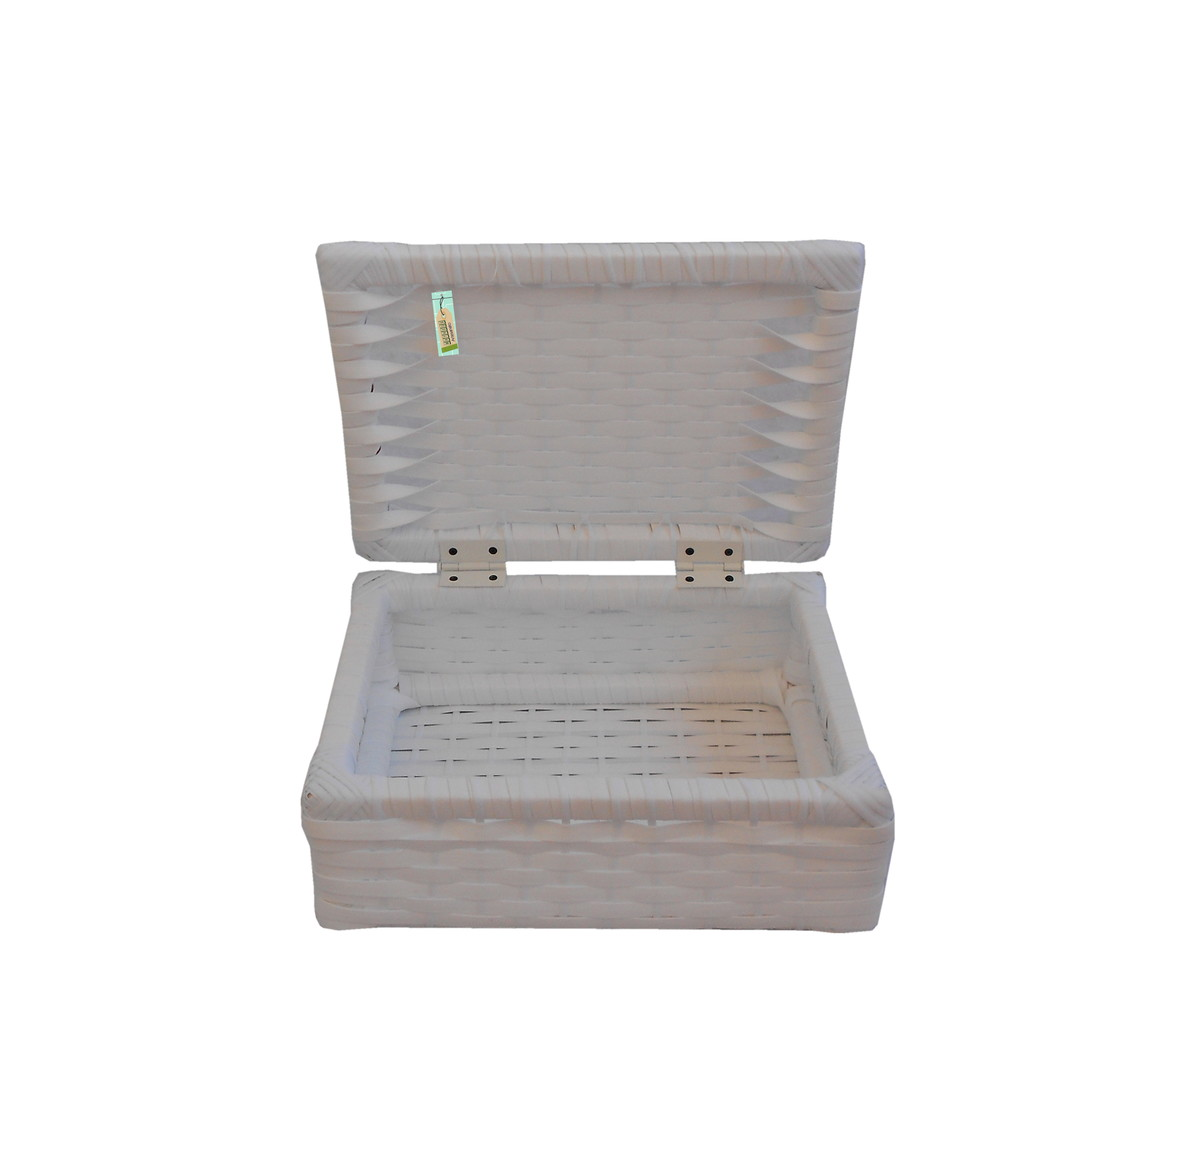 caixa fibra sintetica branca 28x20x12 fibra sintetica #727943 1200x1172